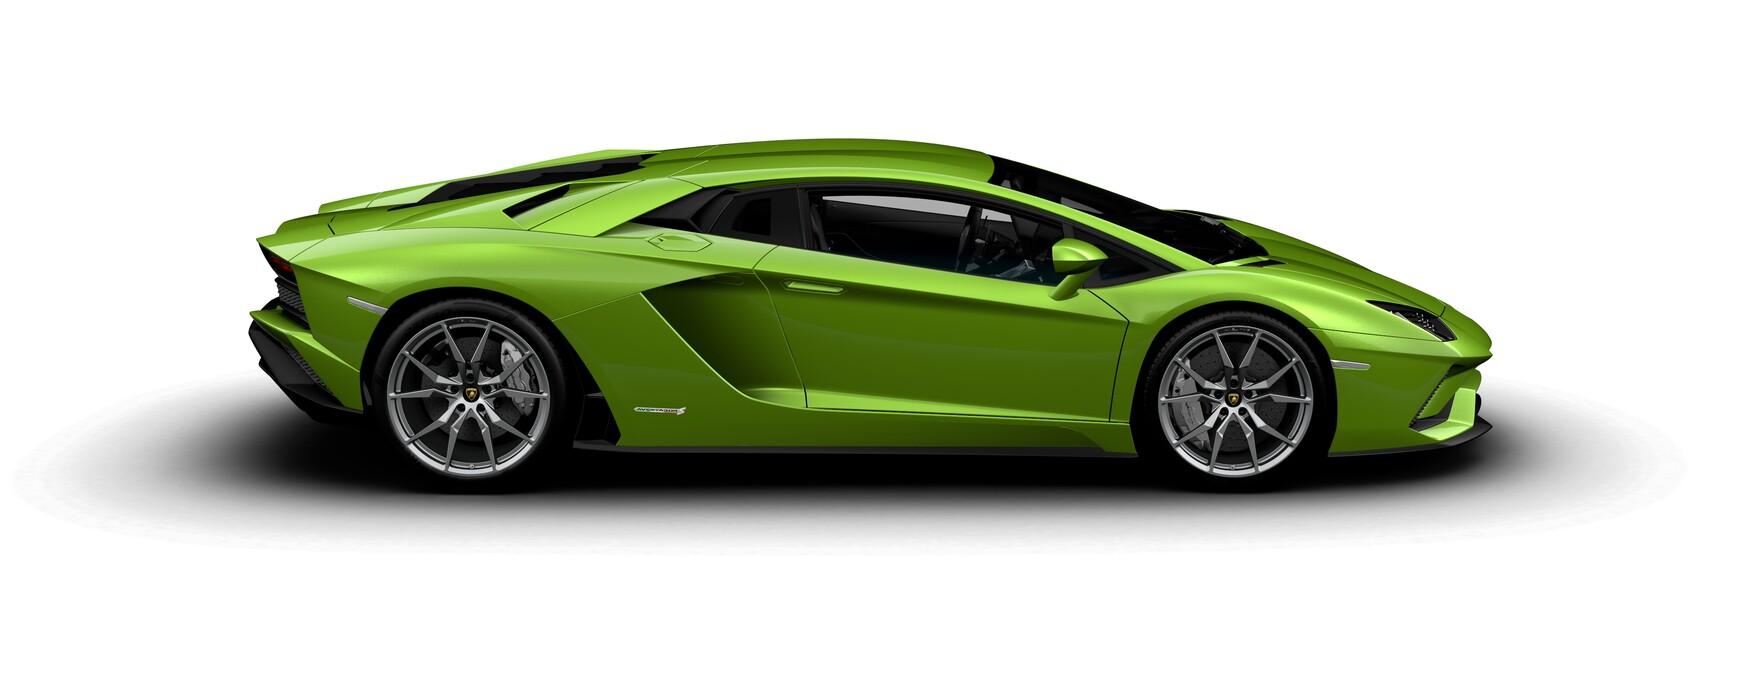 Lamborghini Aventador S Coupe pearl Verde Ithaca side view